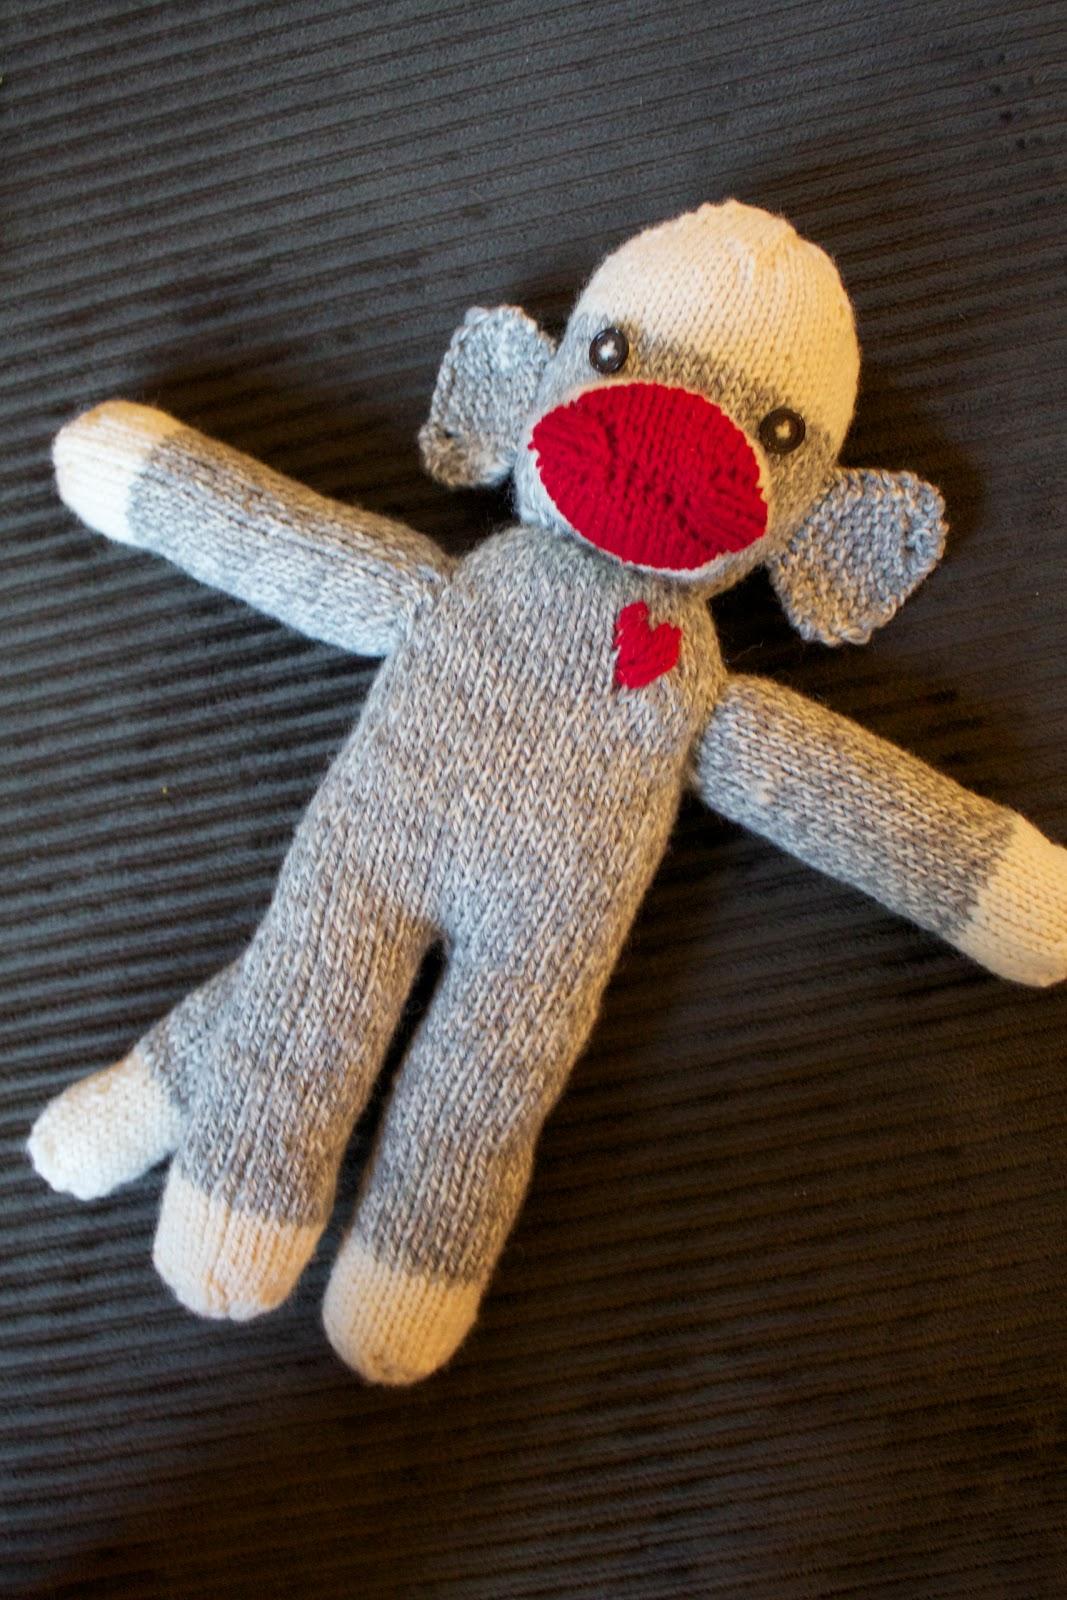 Handmade by Meg K: Sock Monkey Pattern and Tutorial